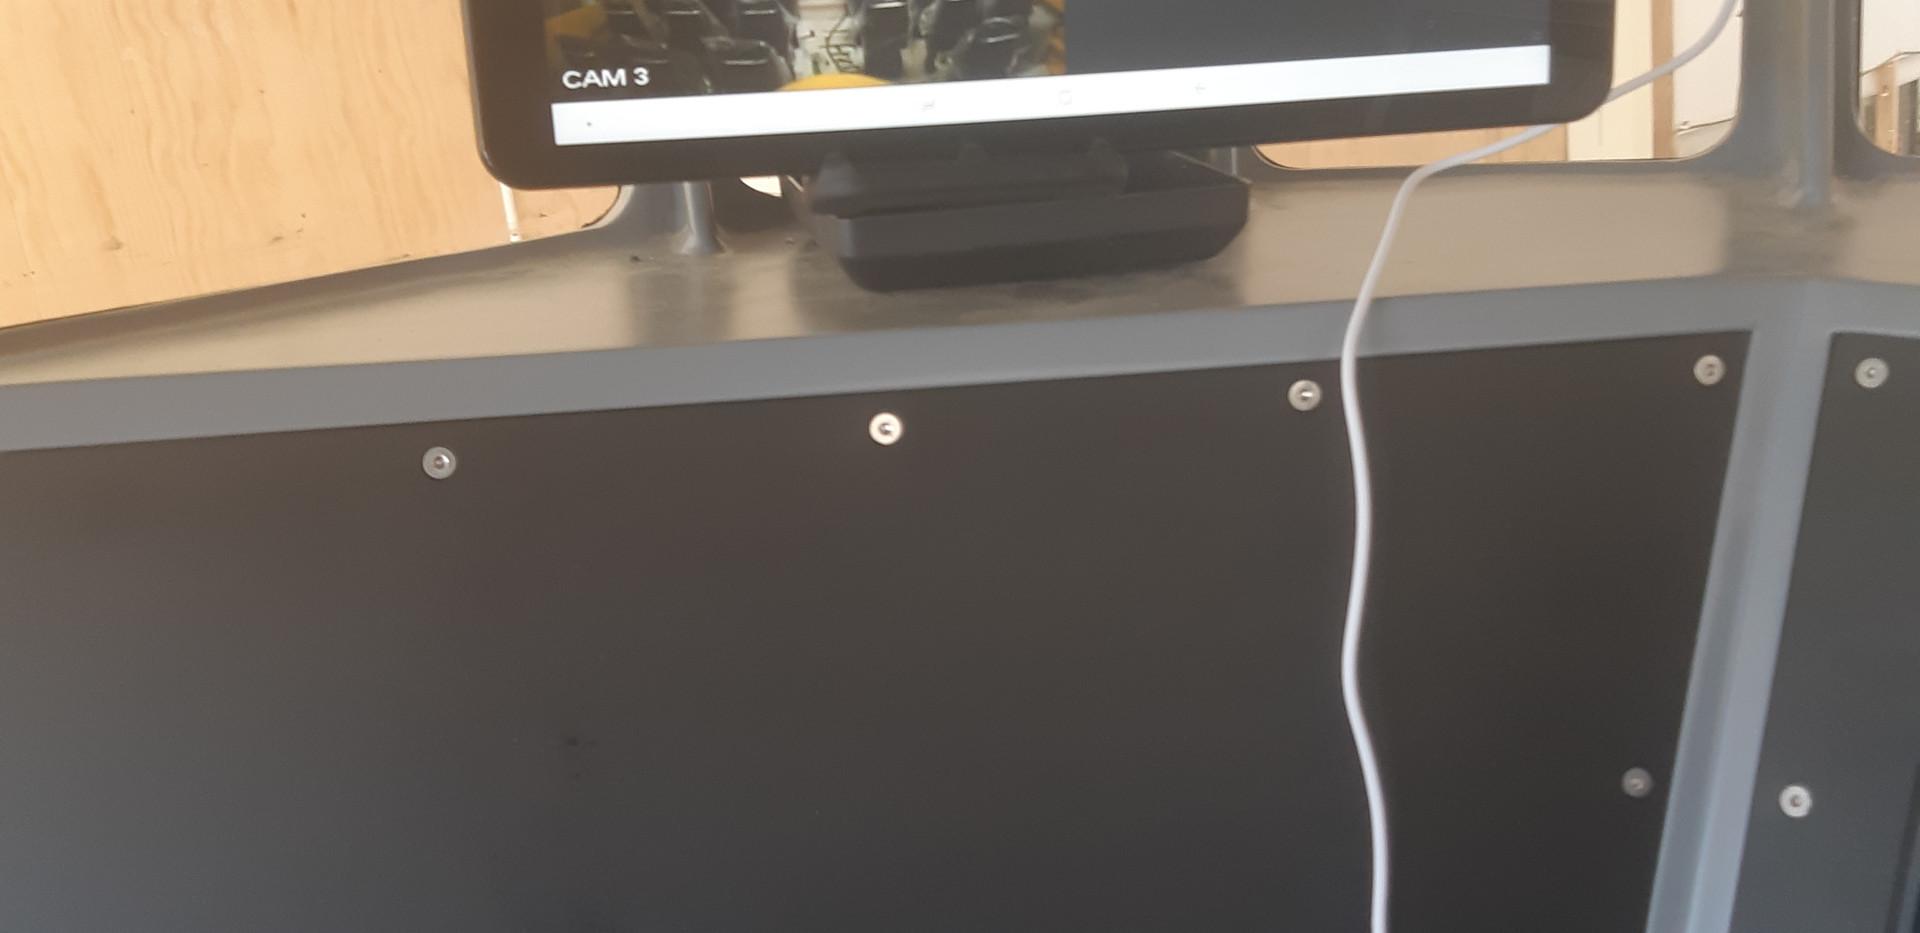 CCTV display